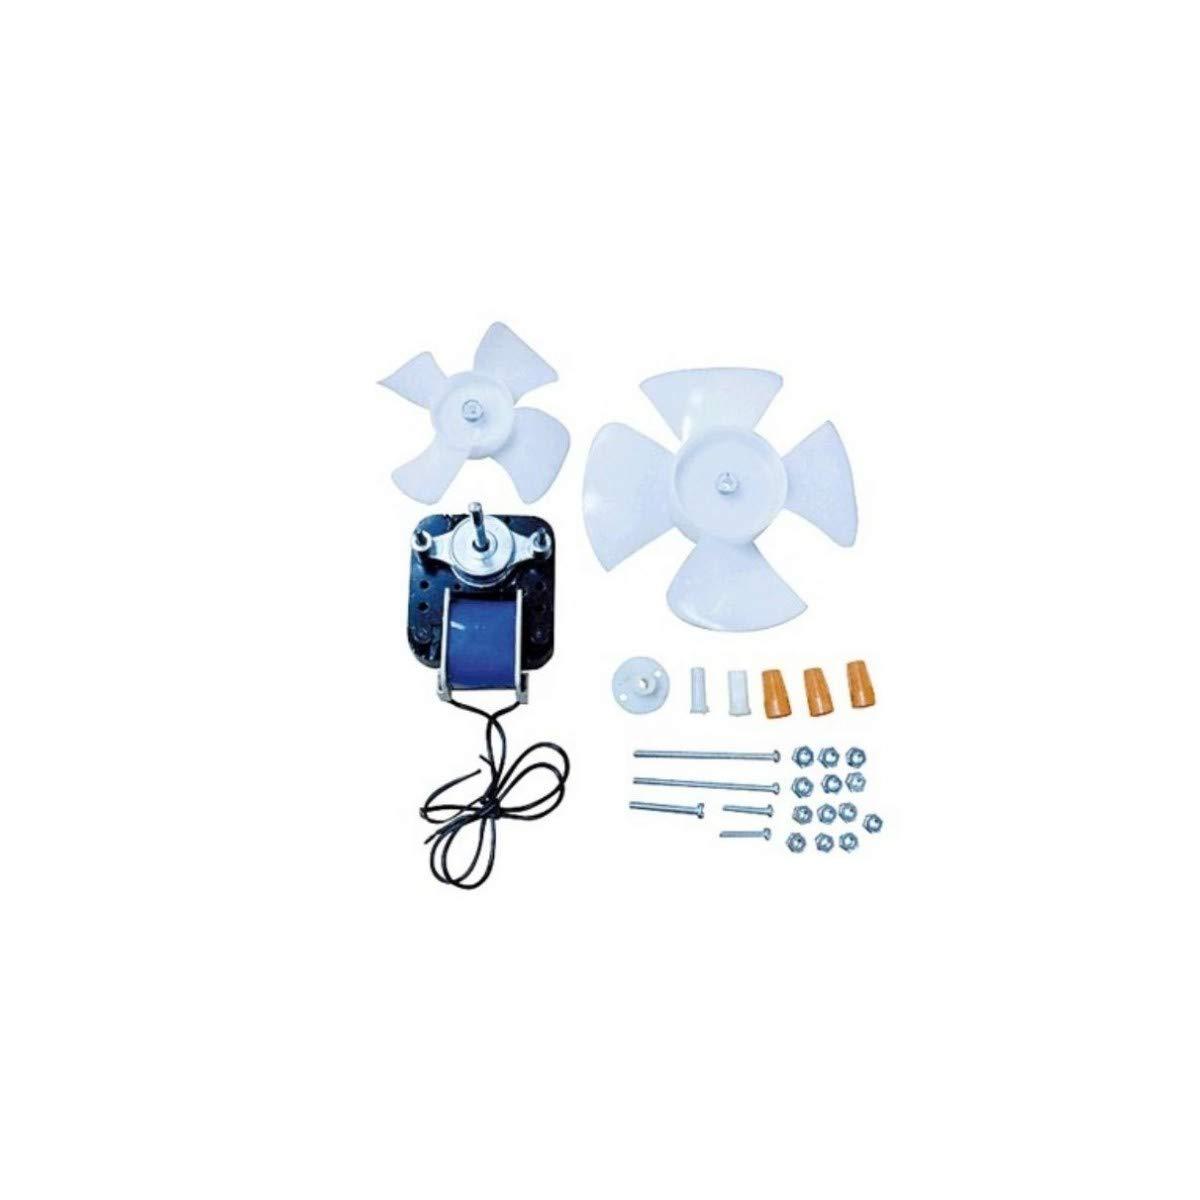 Recamania Motor Ventilador frigorifico Standard NO Frost YZF672 ...